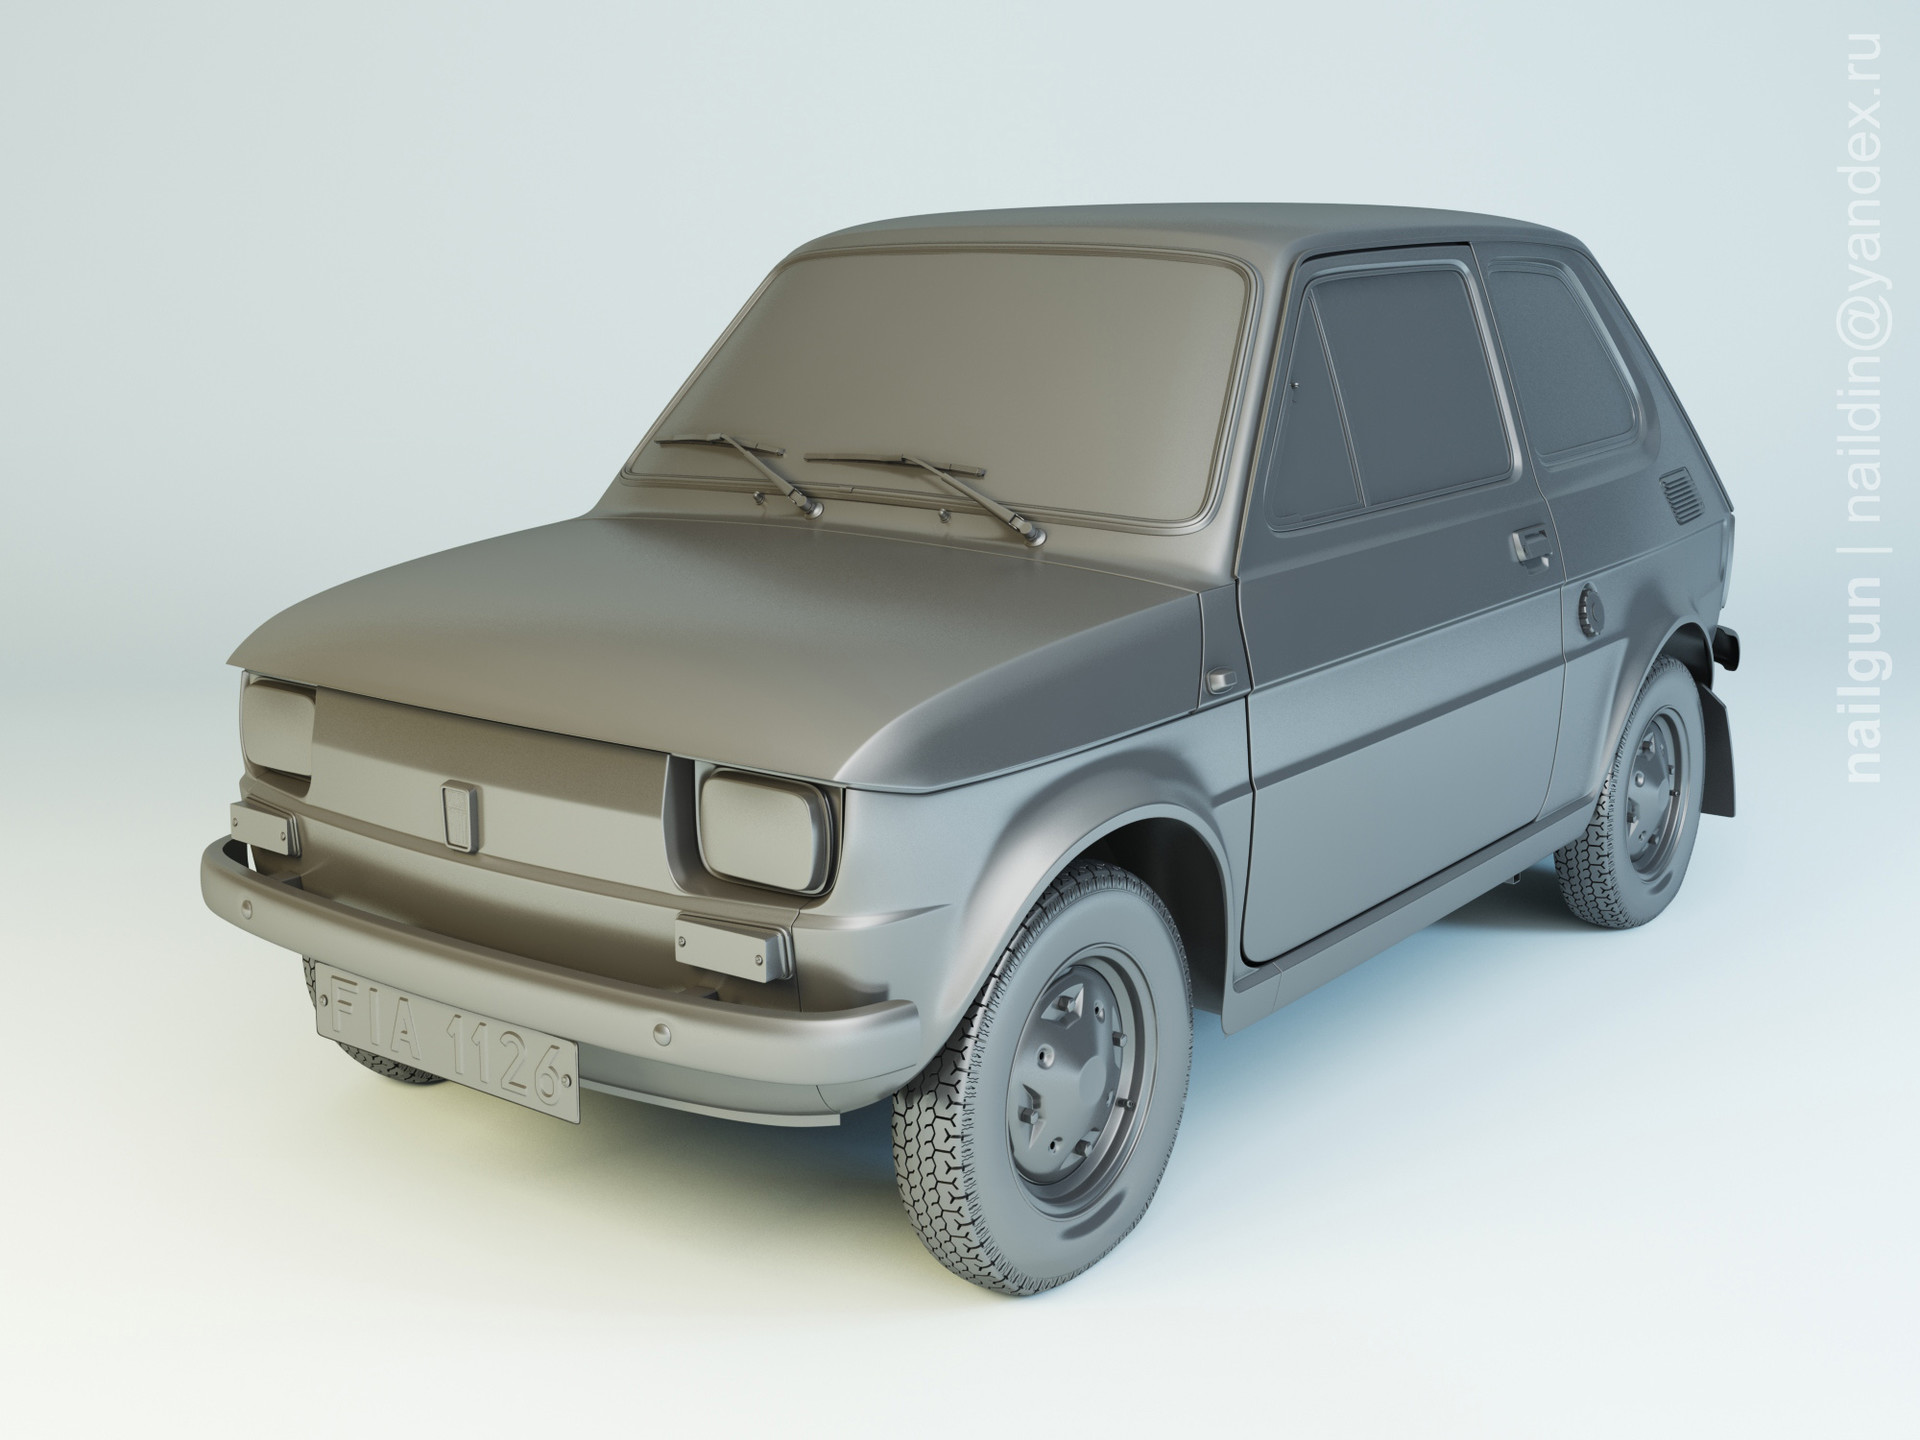 Nail khusnutdinov als 169 003 fiat 126p modelling 0